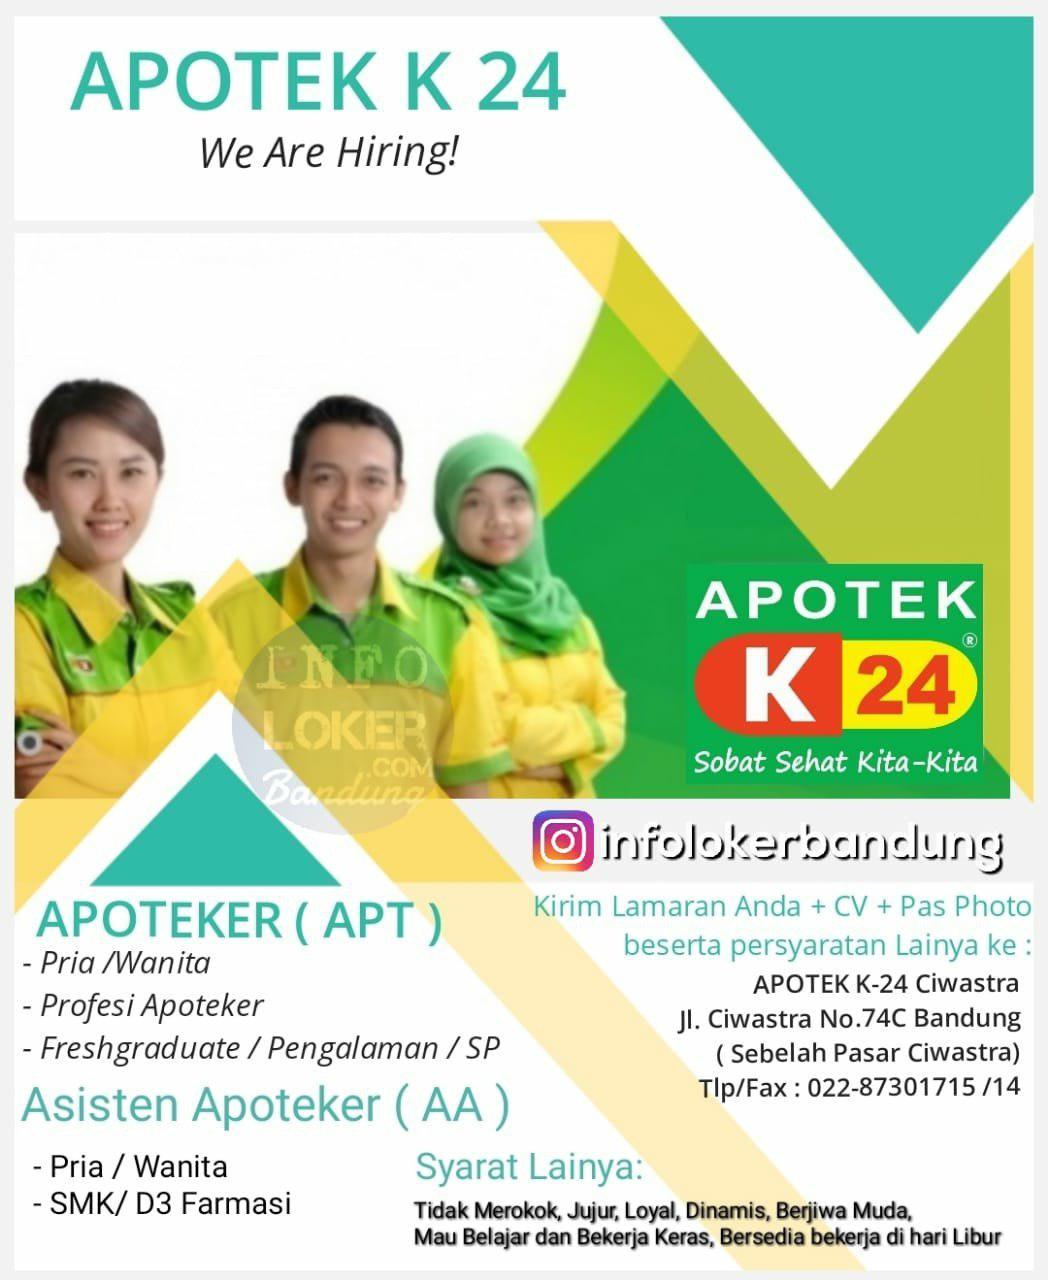 Lowongan Kerja Apotek K 24 Ciwastra Bandung Juni 2018